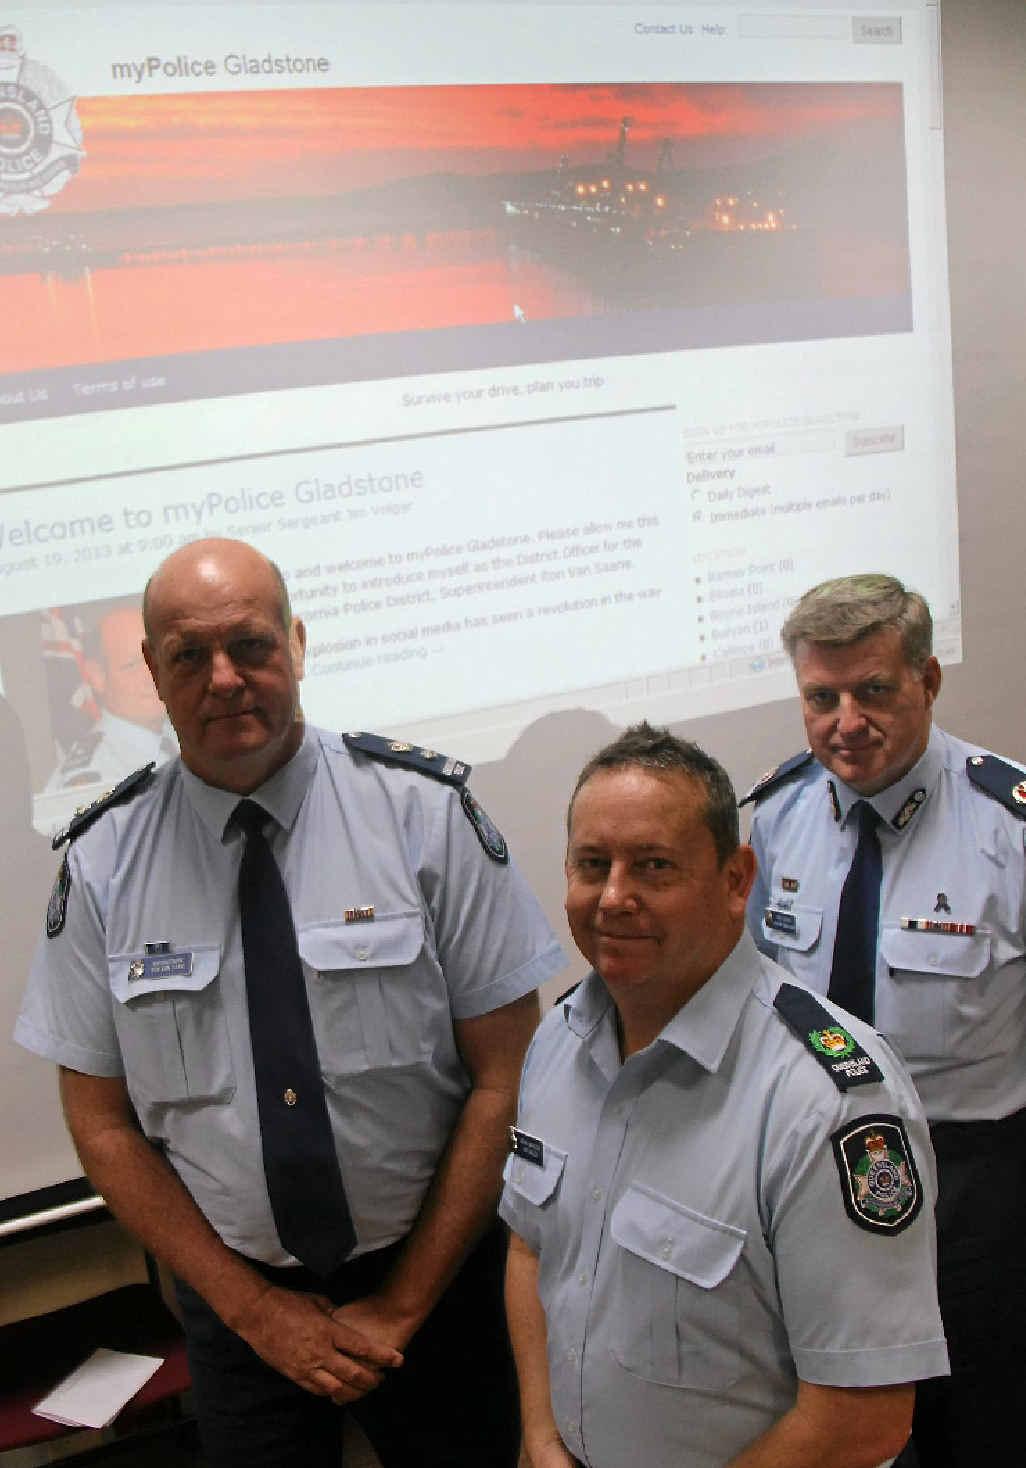 Police launch the myPolice Gladstone web blog.